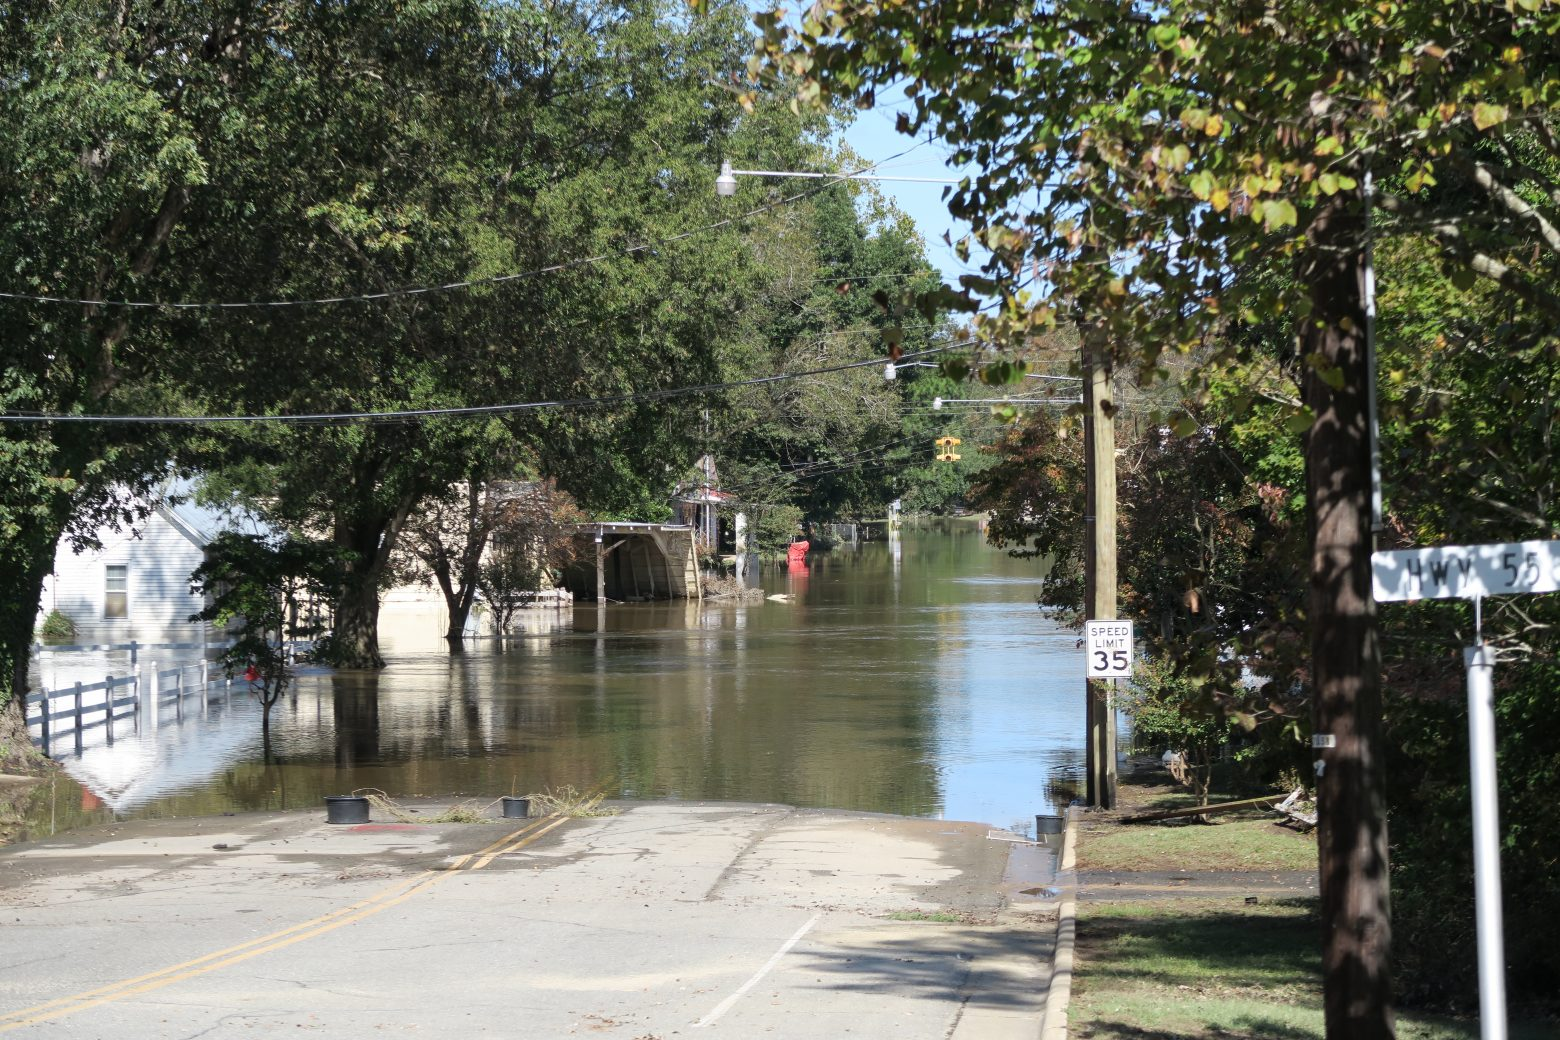 Wayne County Flooding 10.10.16 (22)